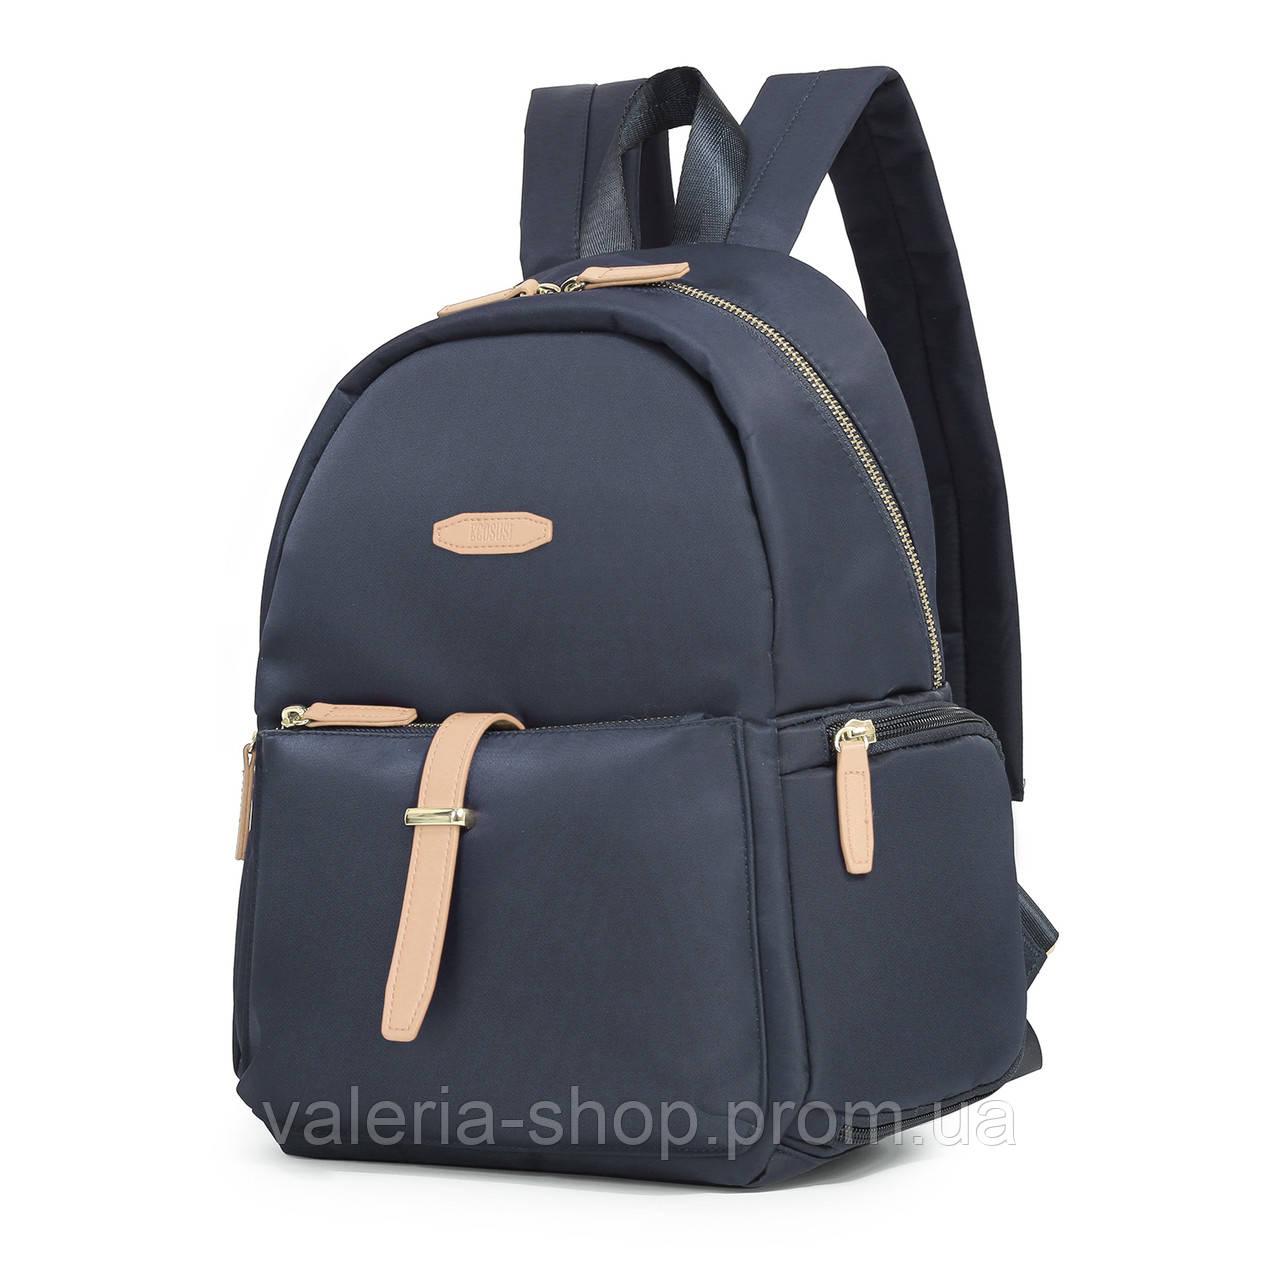 Женский рюкзак Ecosusi Kim серый